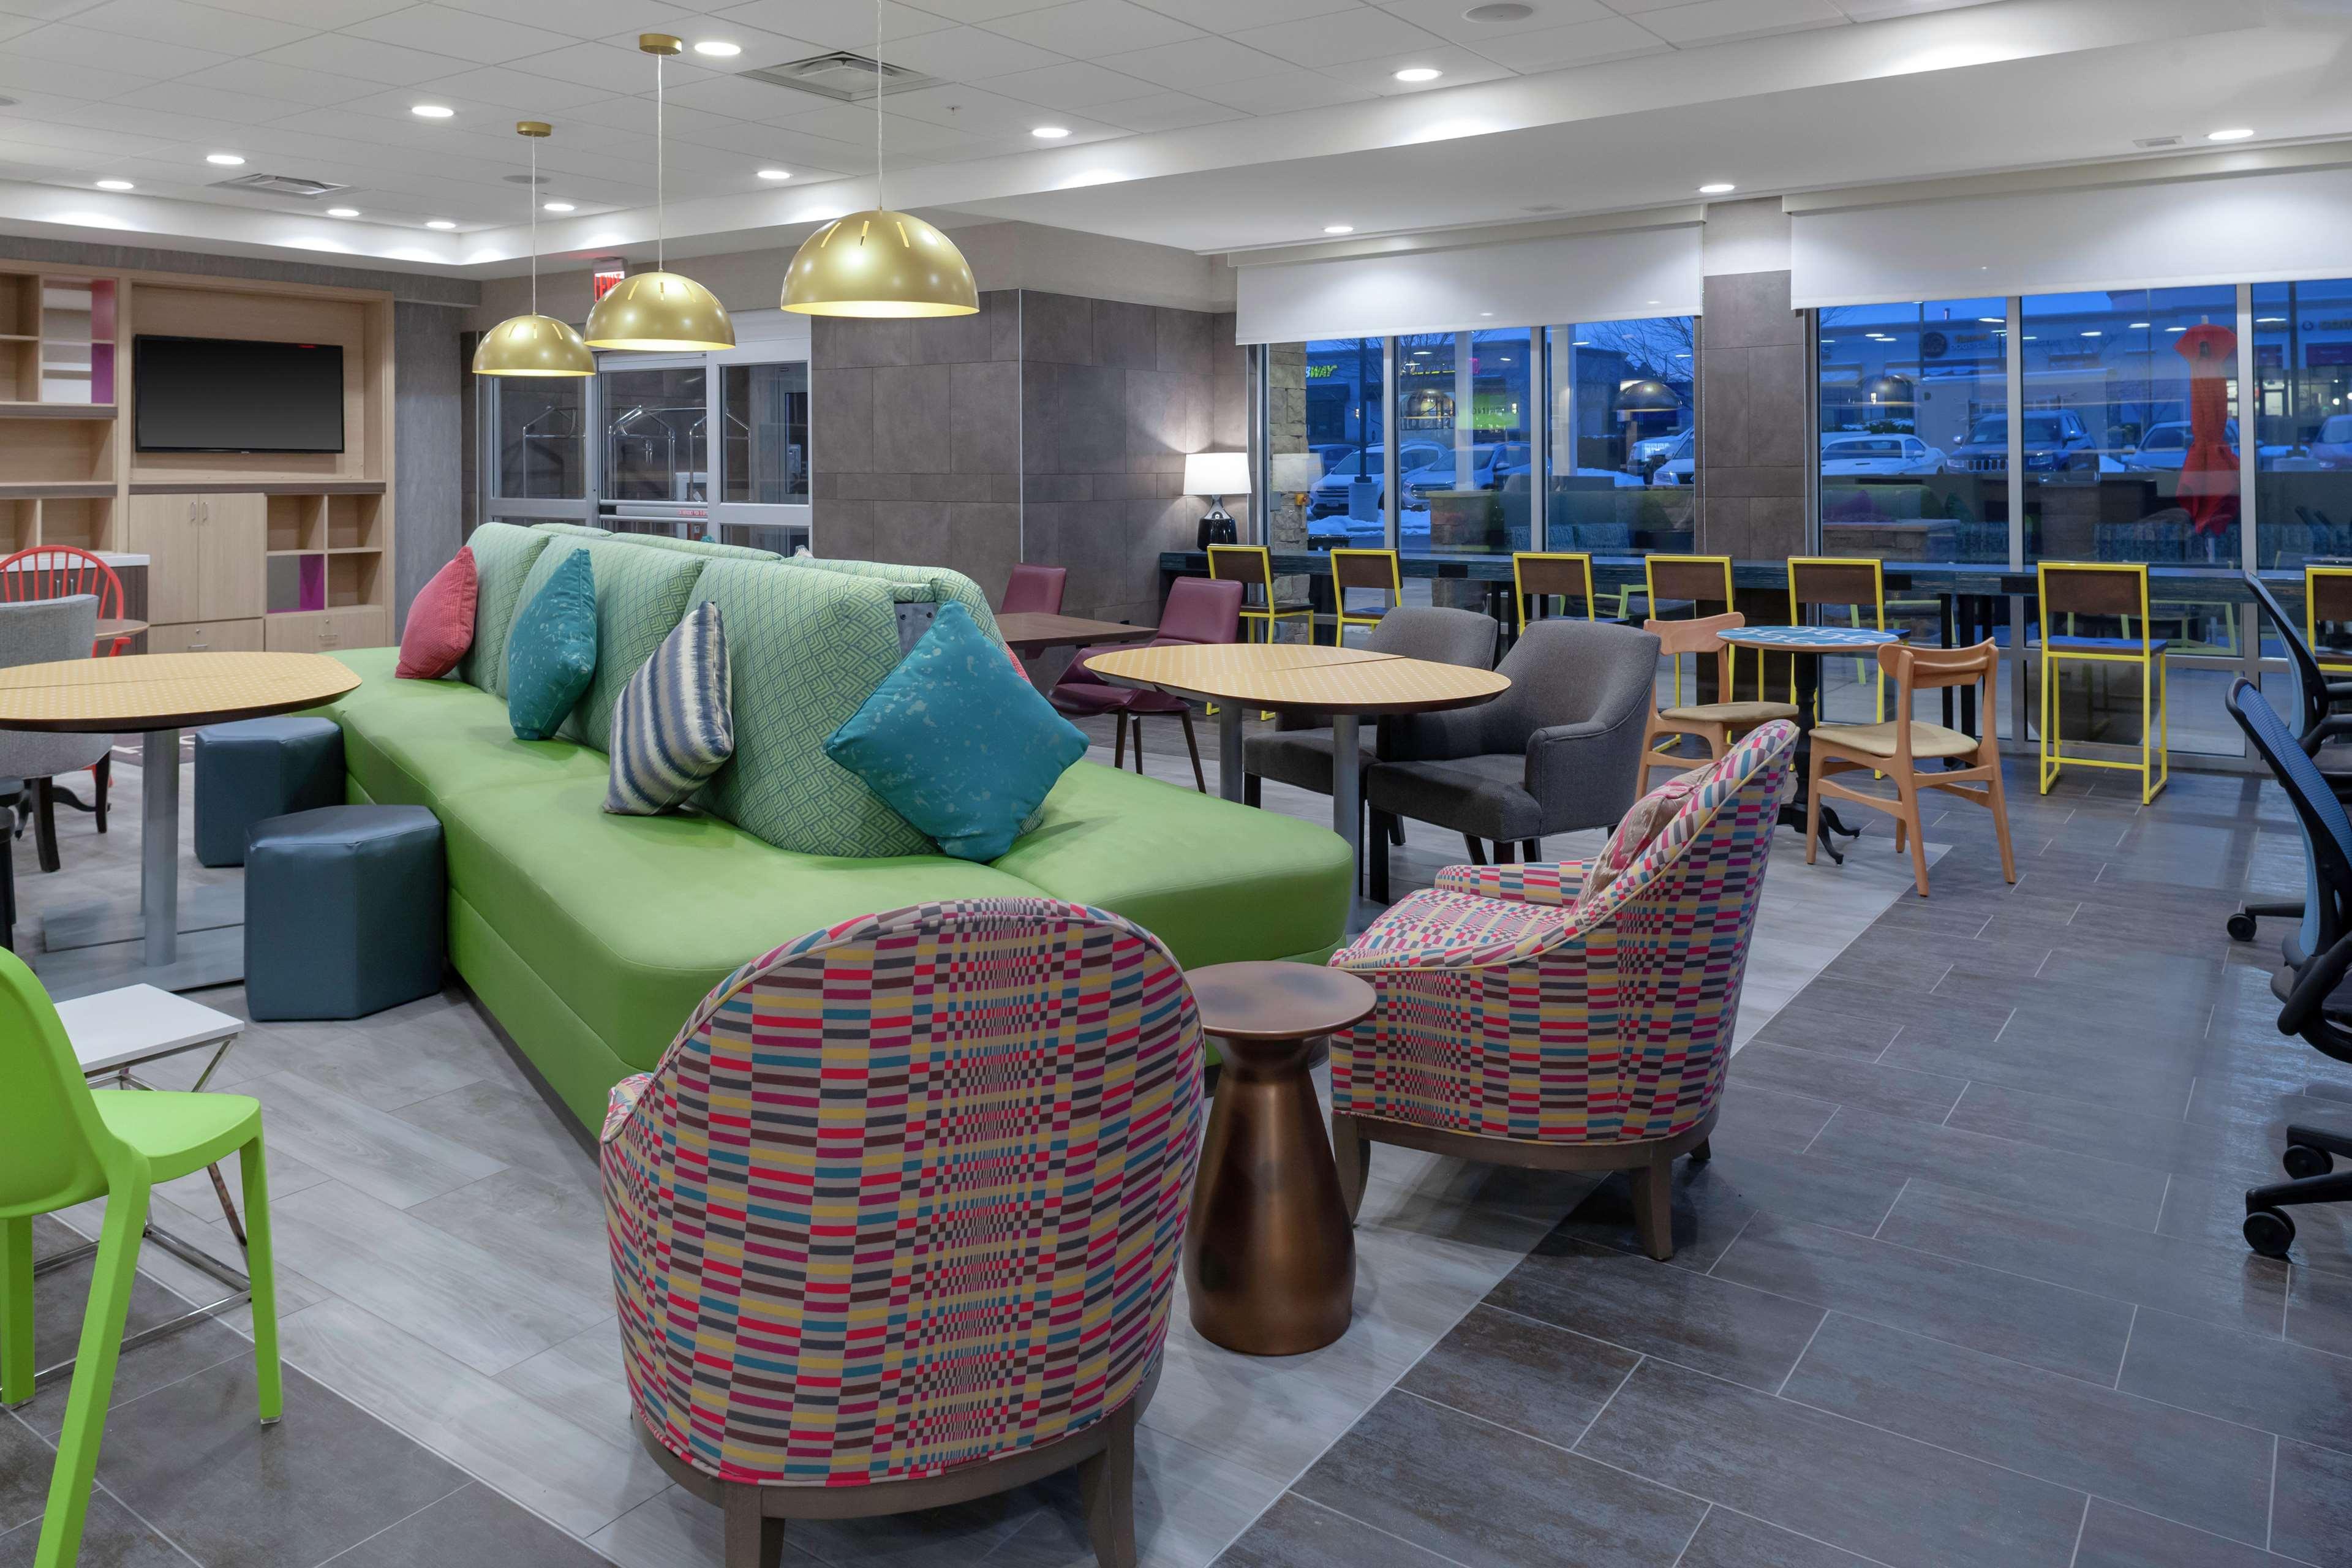 Home2 Suites by Hilton Denver South Centennial Airport